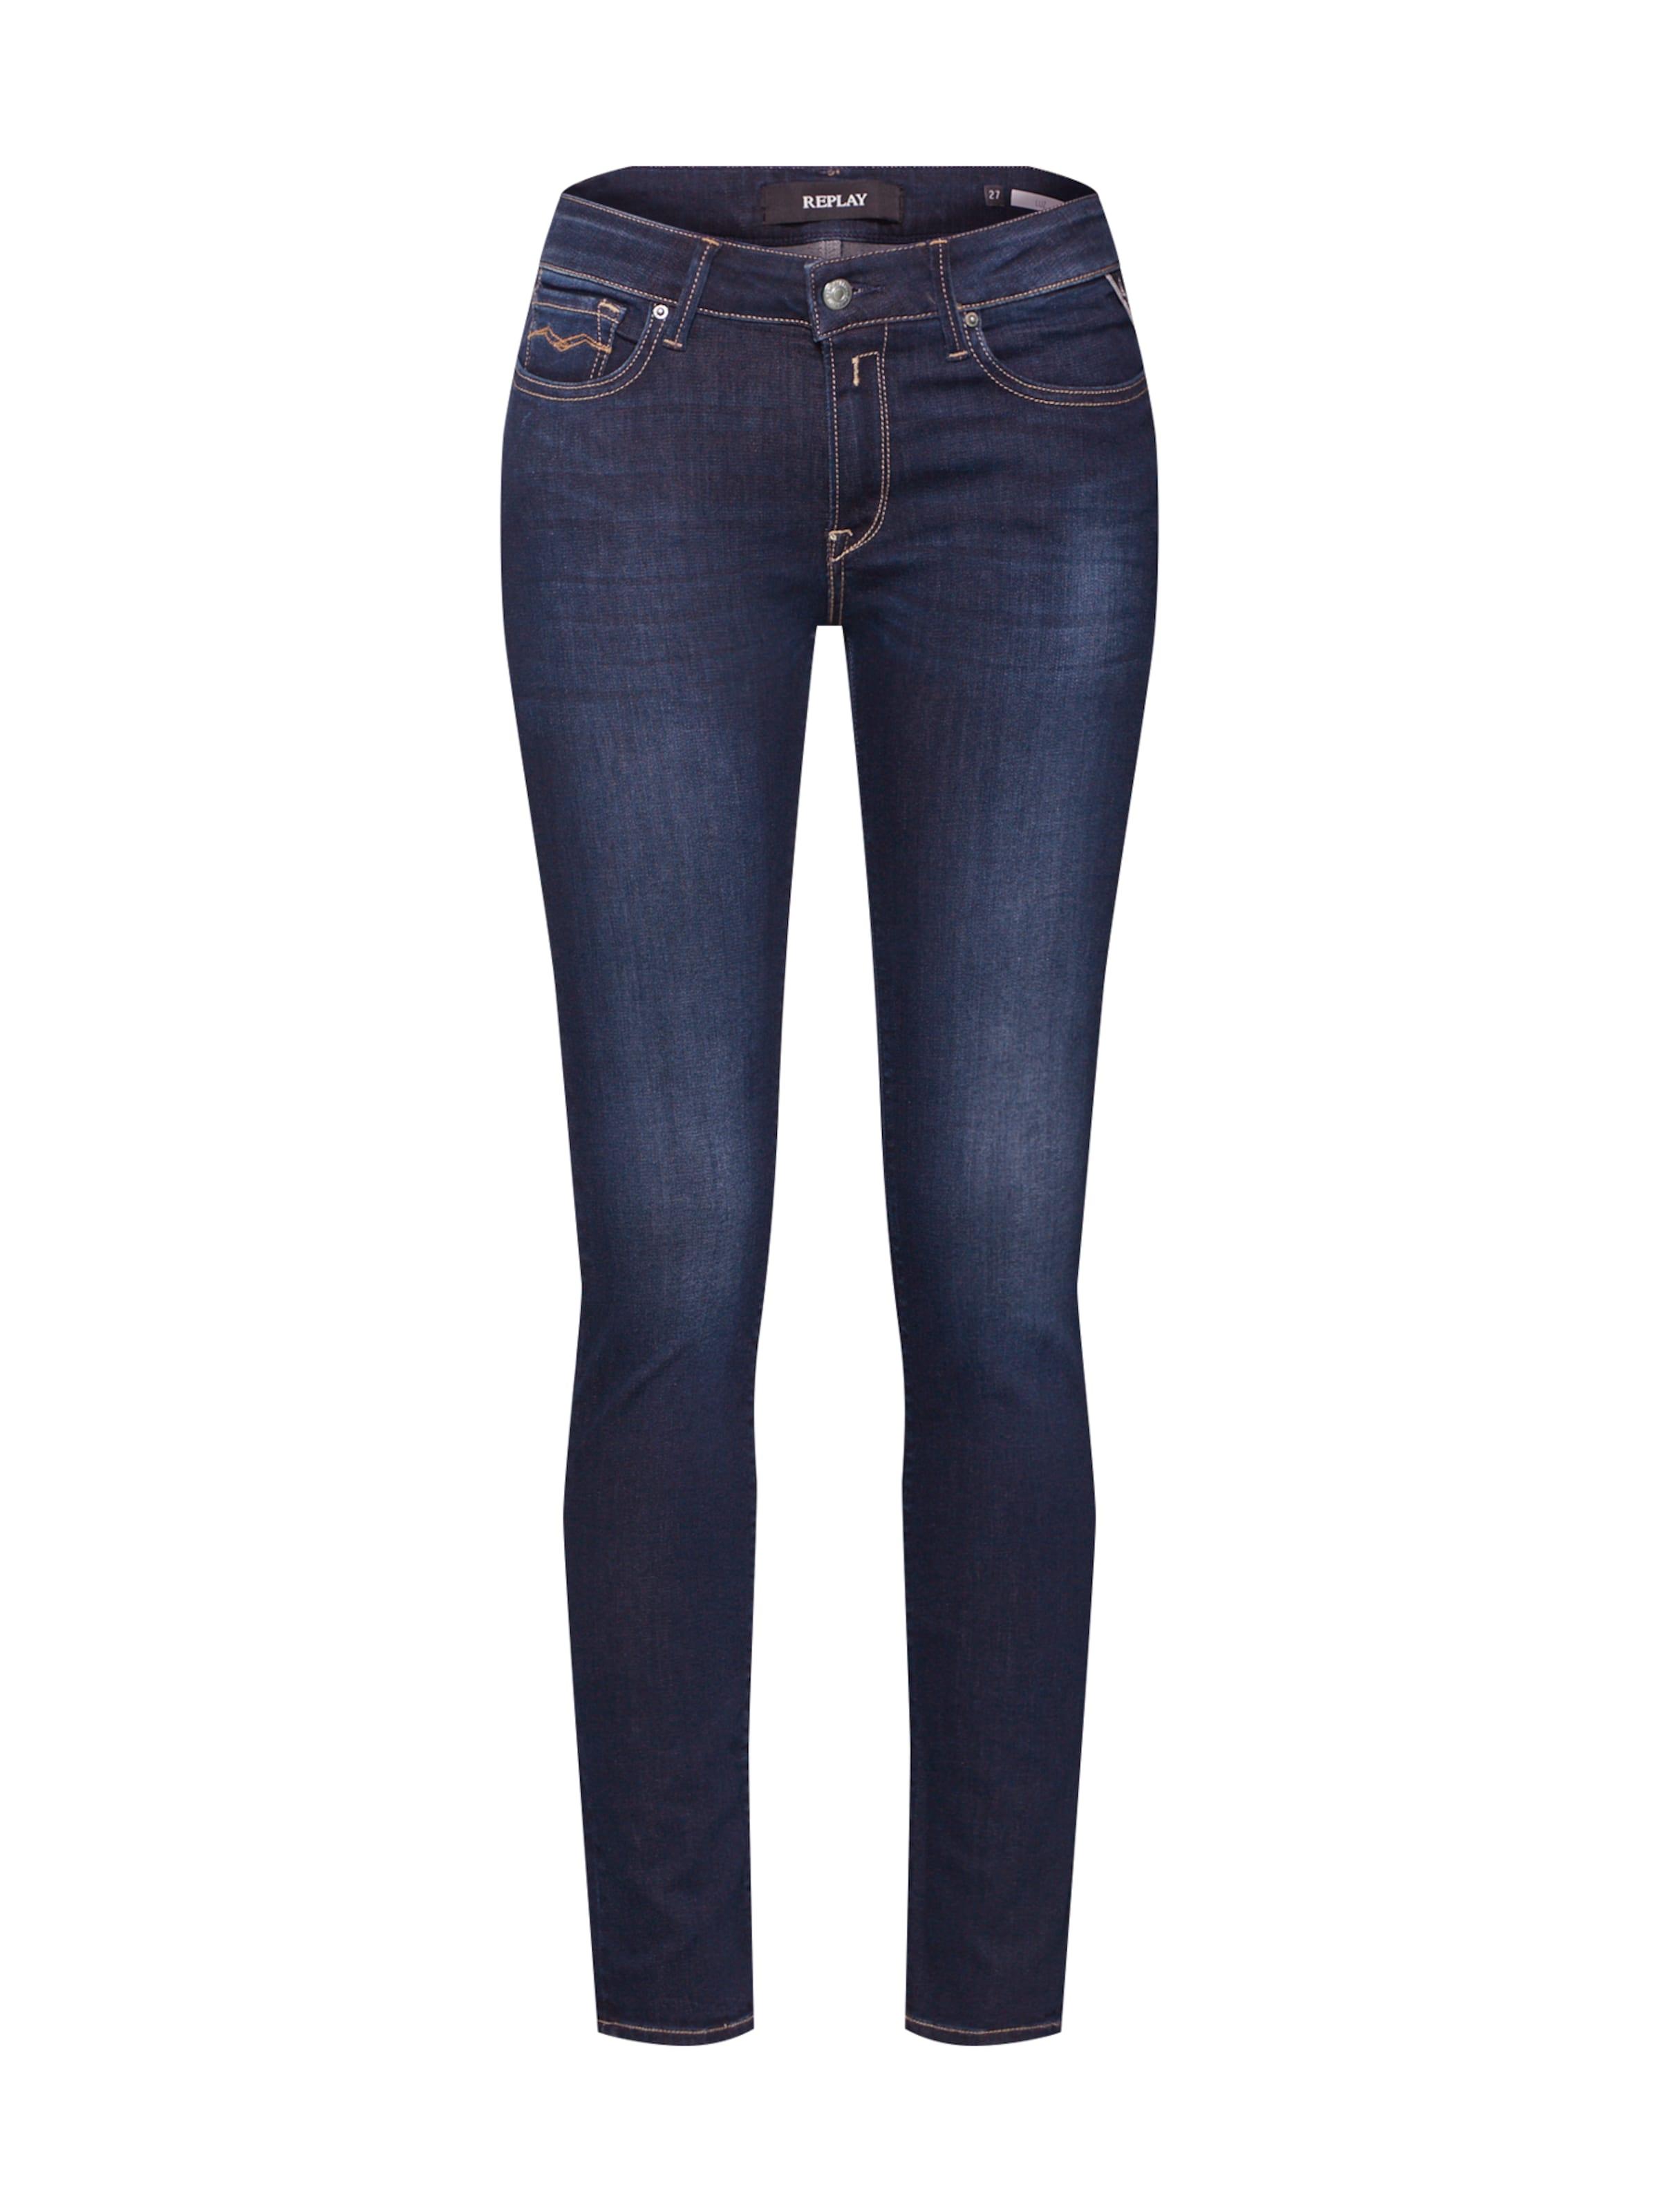 In Denim Replay High 'luz Jeans Blue Waist Pants' lc1FJK